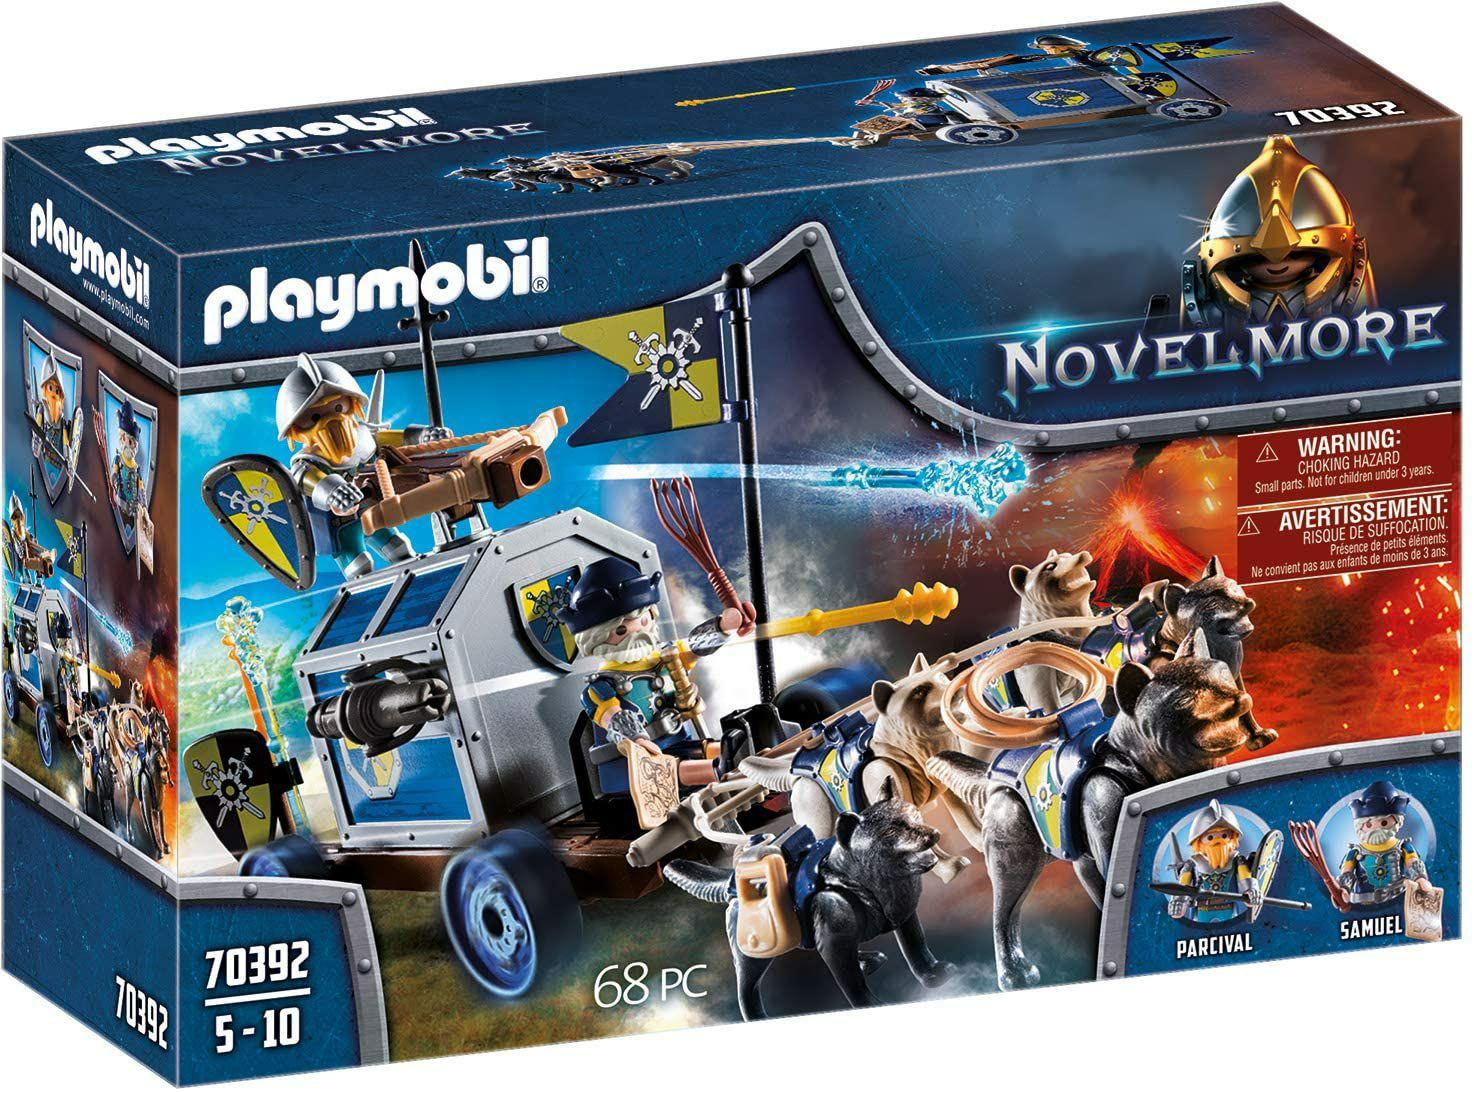 PLAYMOBIL- Transporte del Tesoro Novelmore